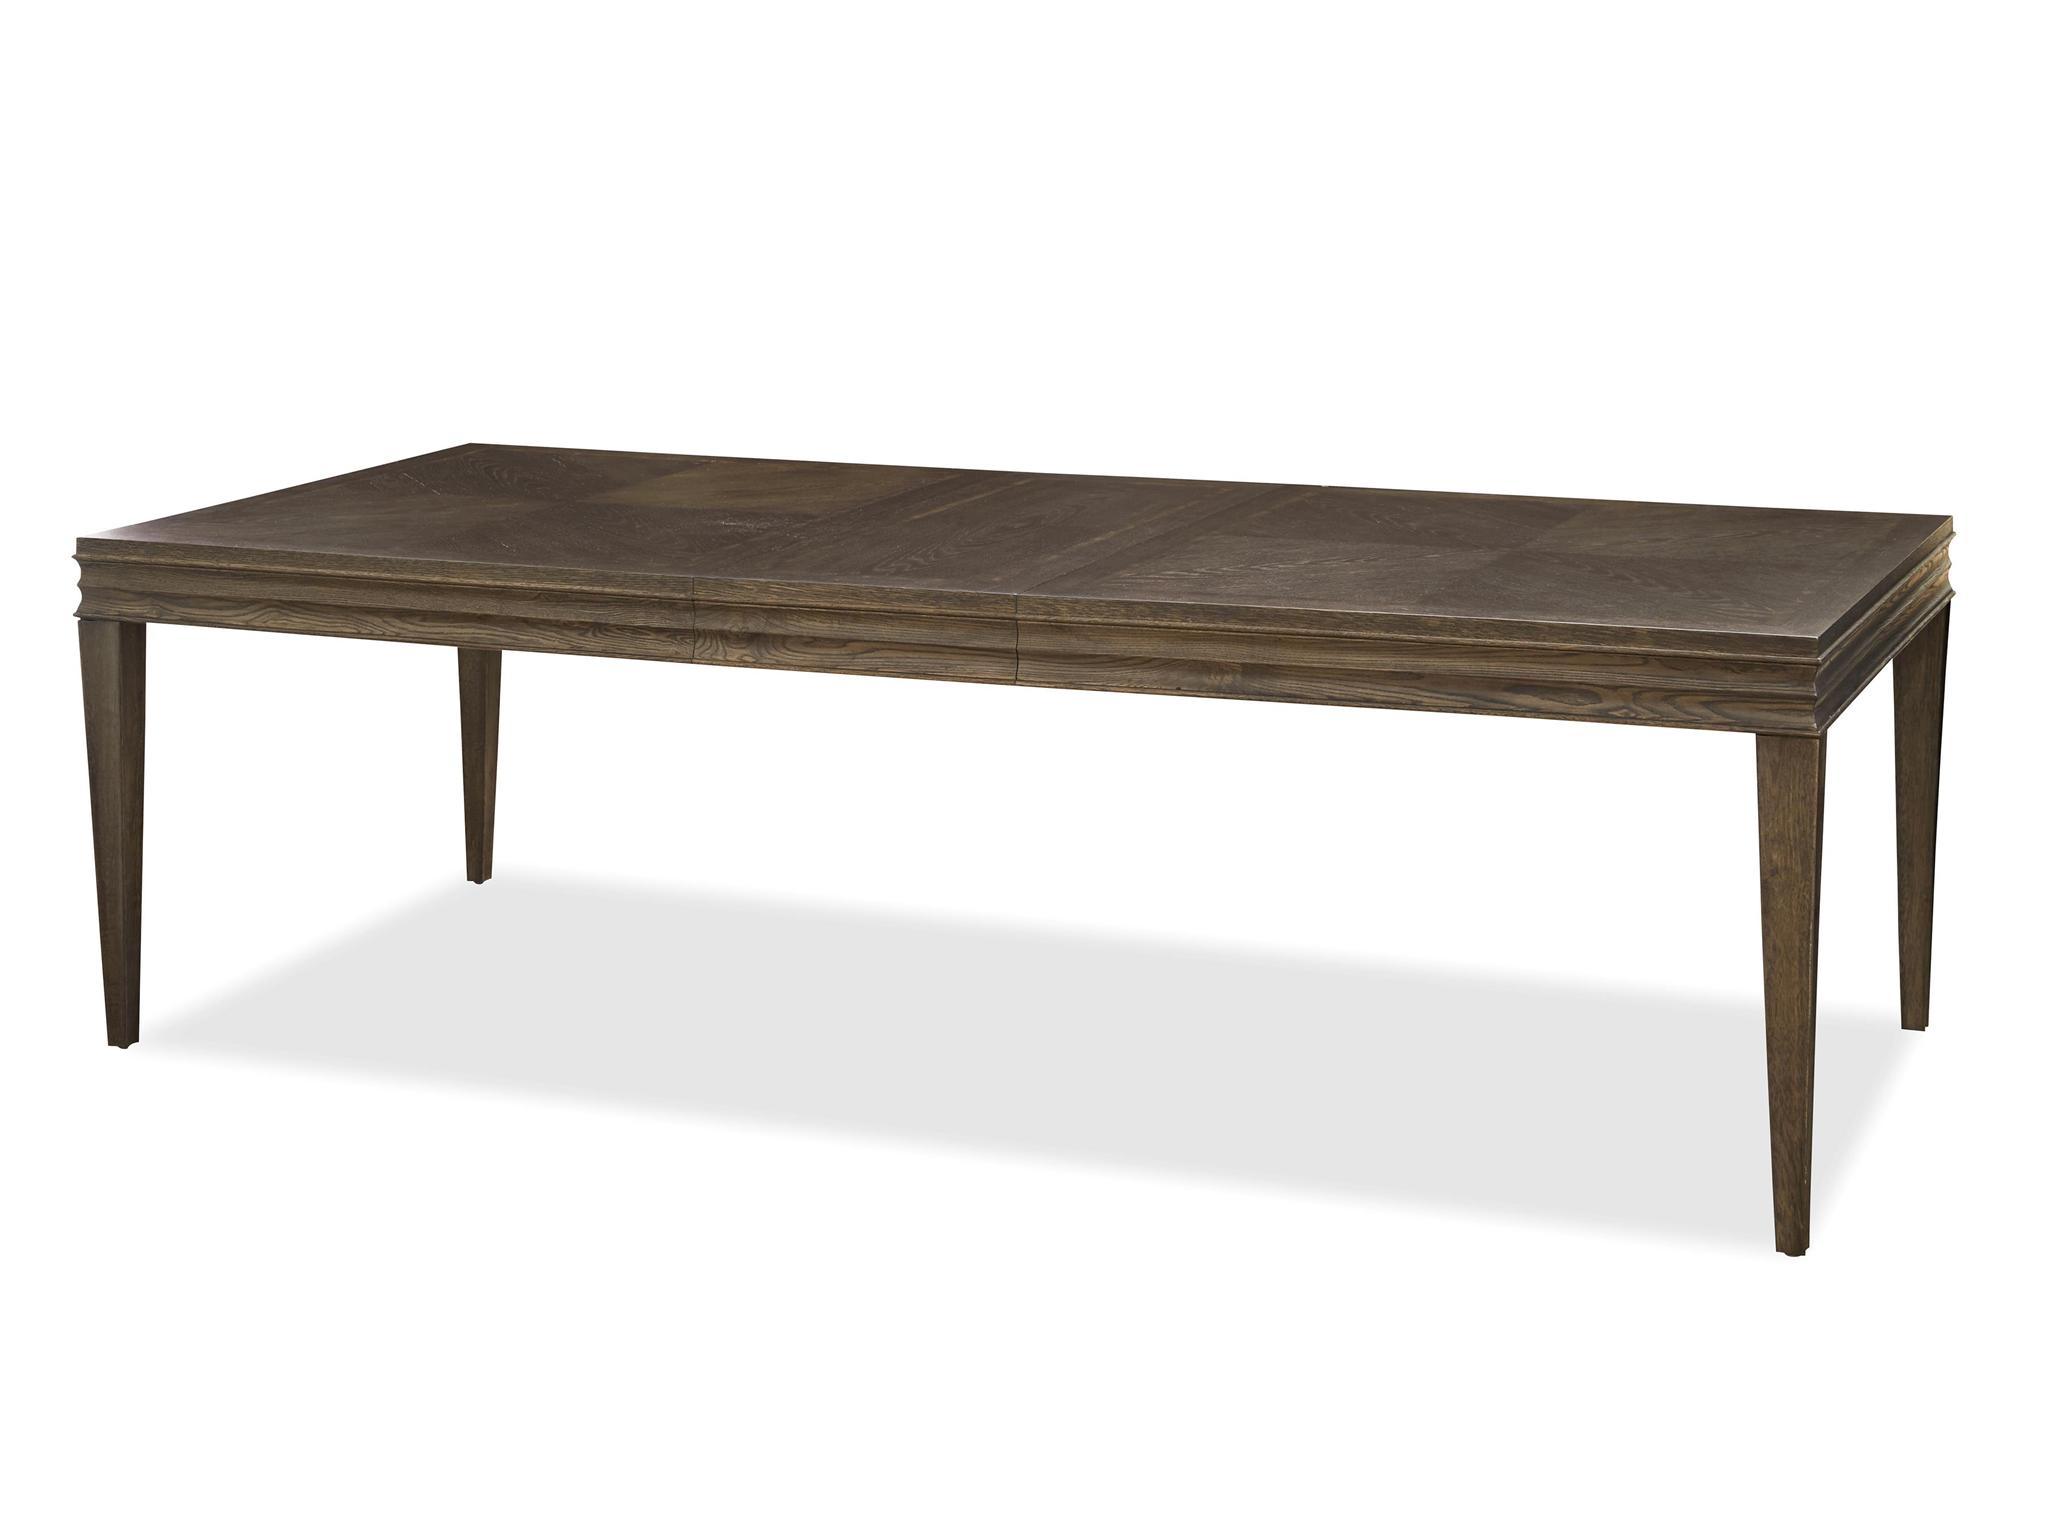 Universal Furniture  California  California Dining Table Simple Universal Furniture Dining Room Set Design Inspiration